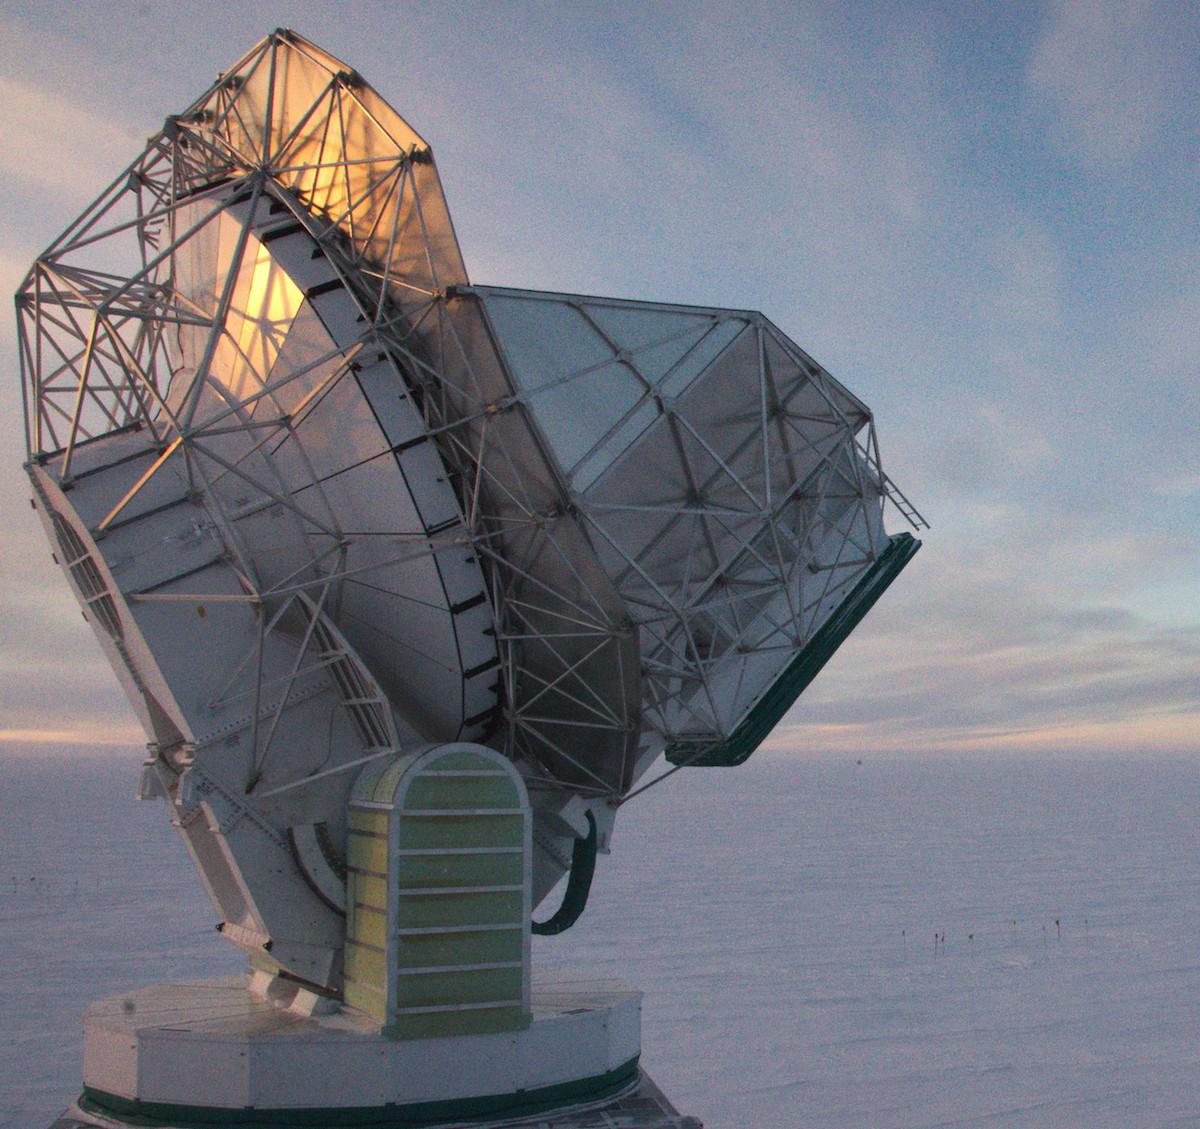 South Pole Telescope Wikipedia